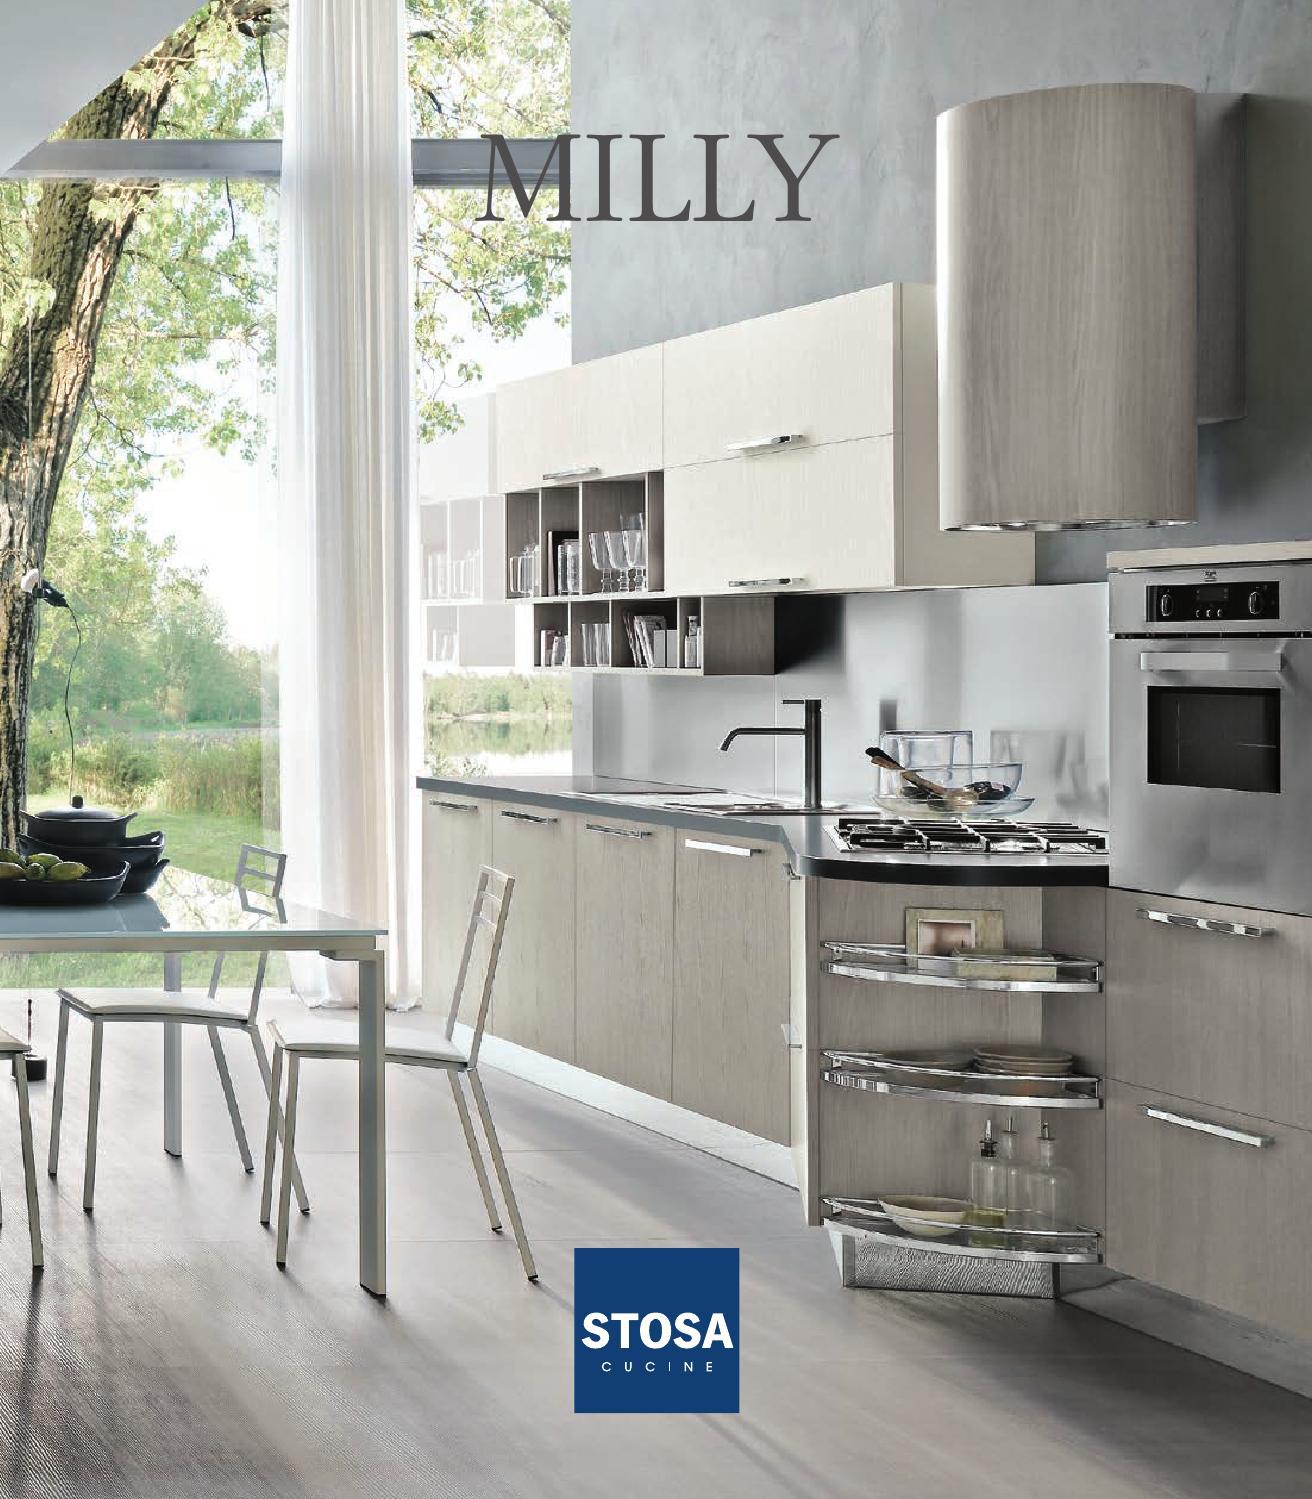 Catalogo cucine moderne stosa milly by STOSA Cucine  Issuu